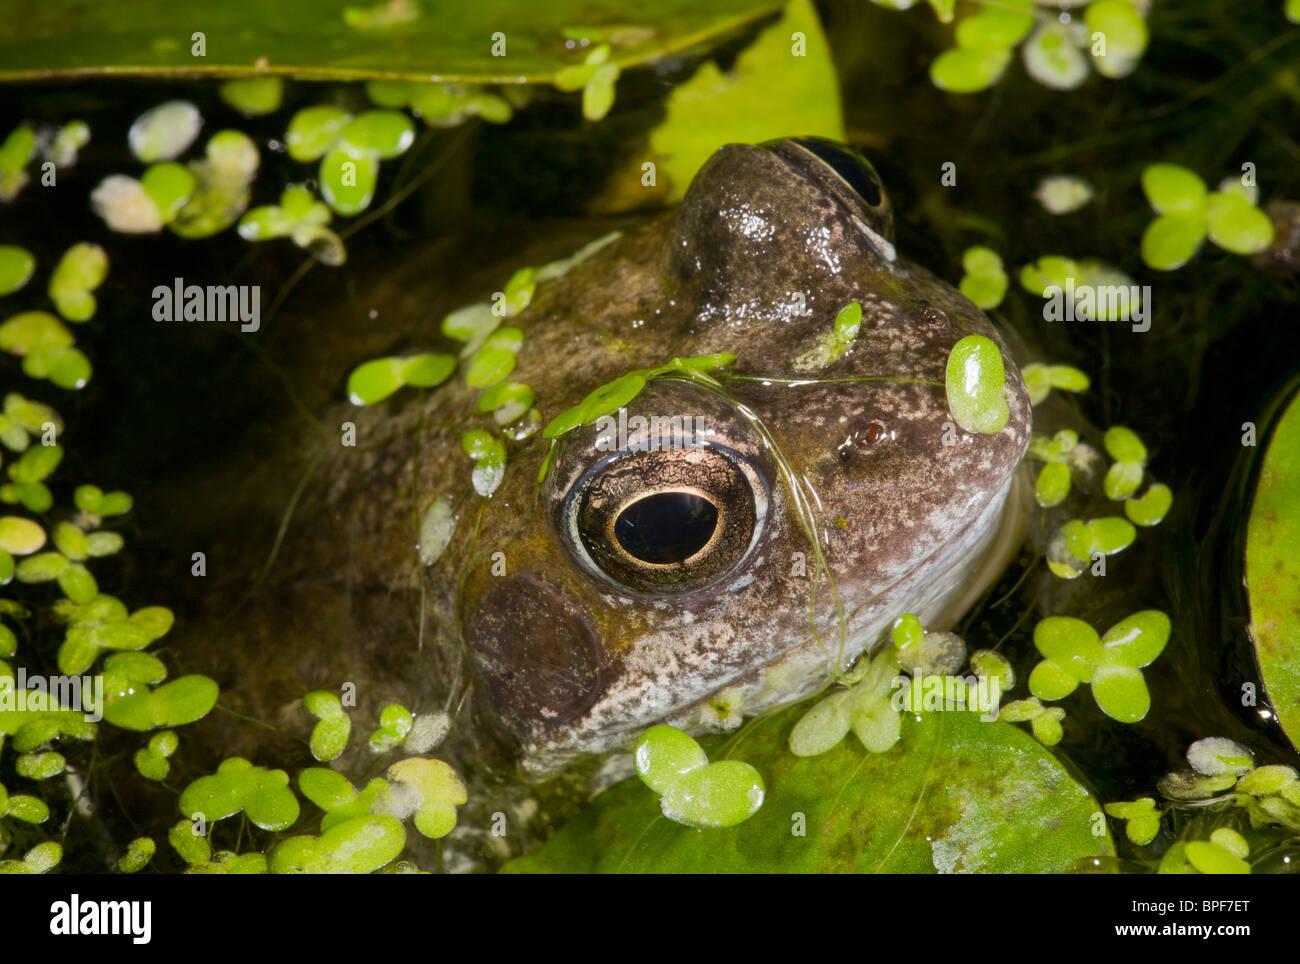 Common Frog, Rana temporaria, in garden pond with duckweeed. Dorset. - Stock Image